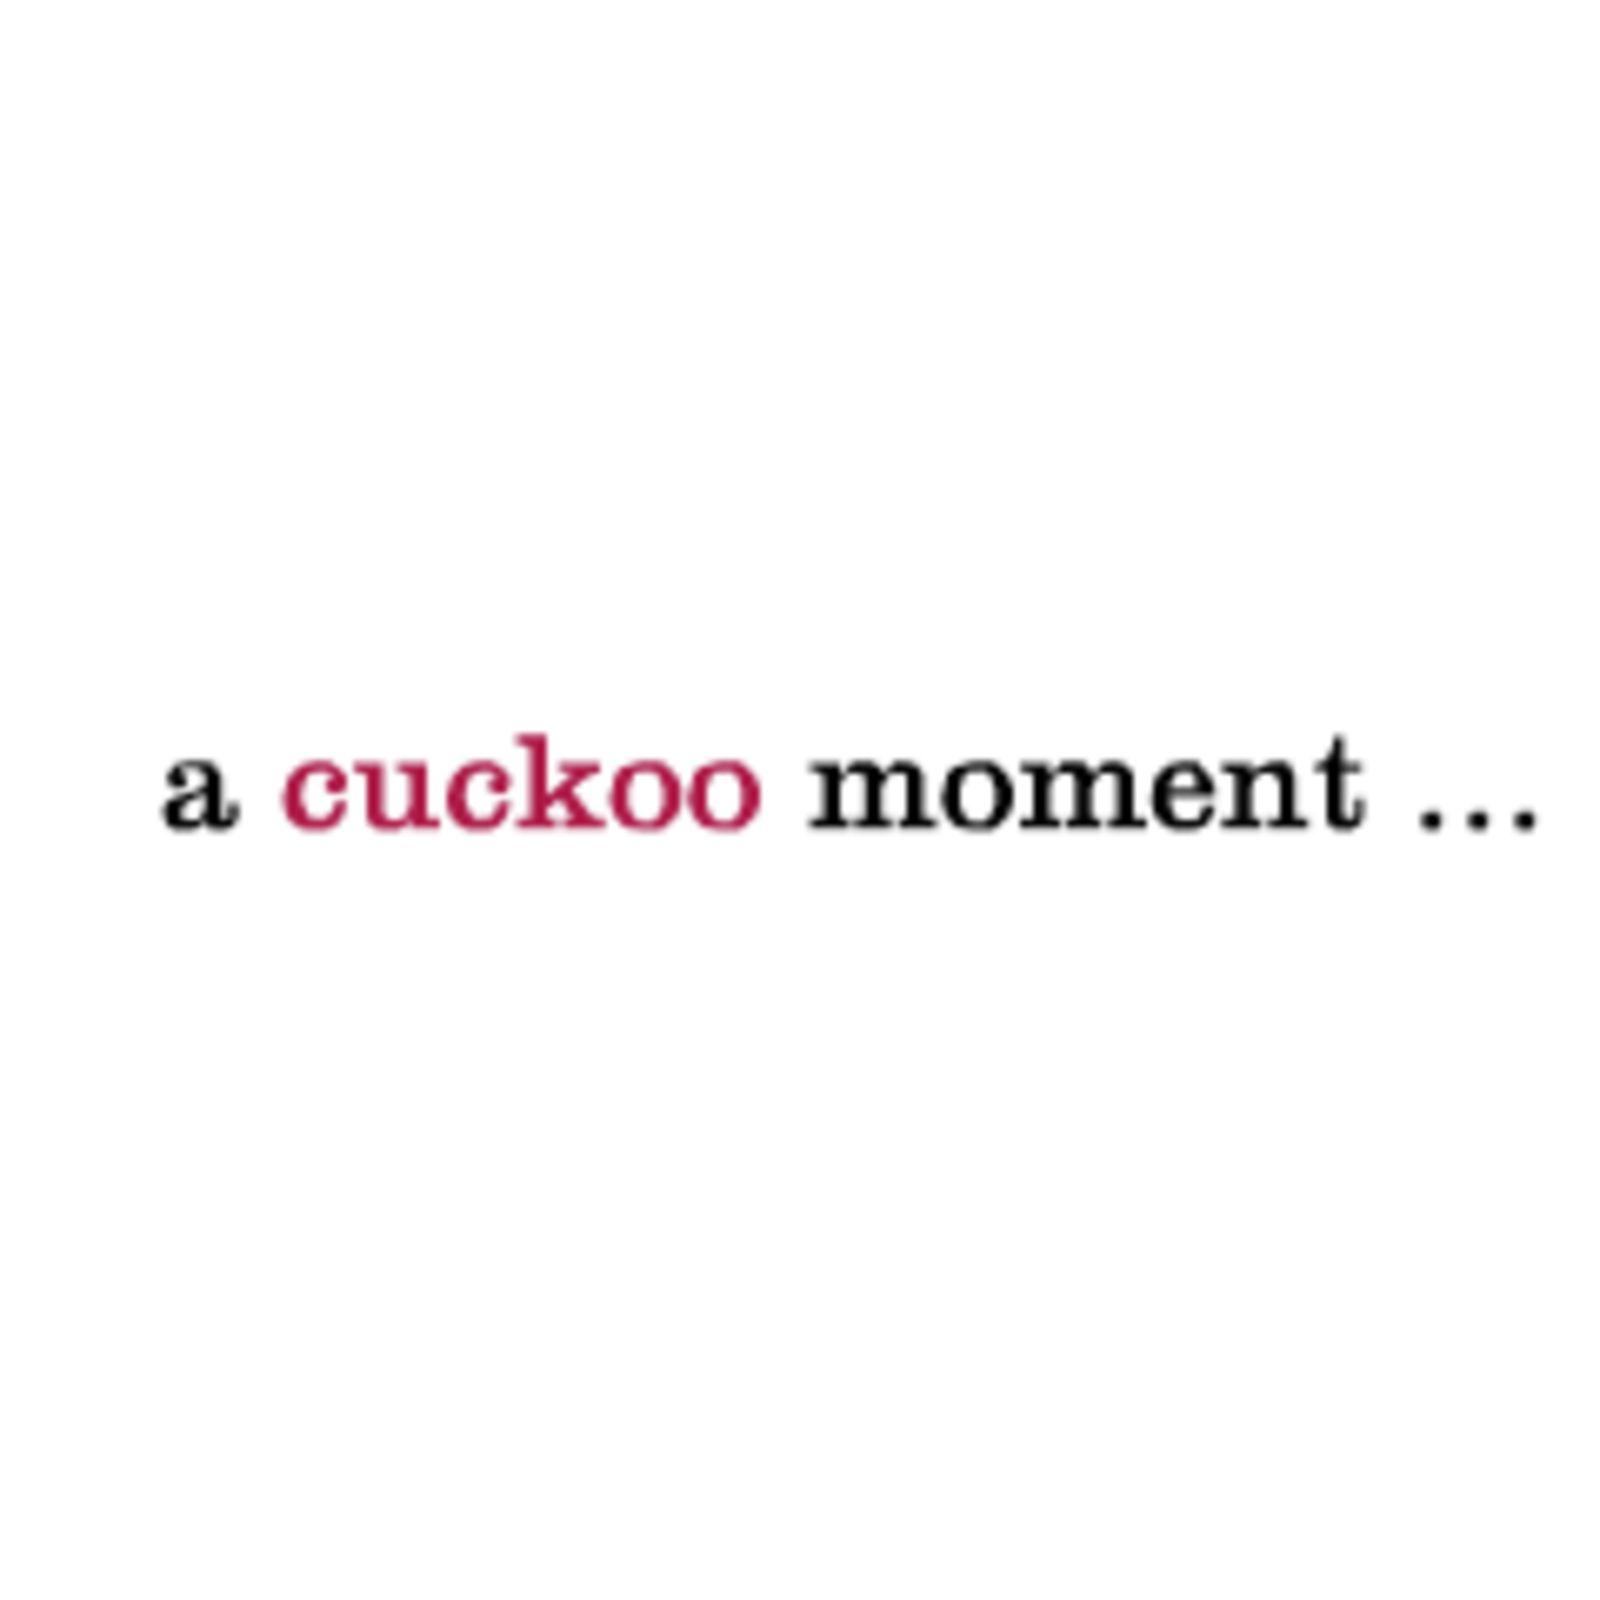 a cuckoo moment